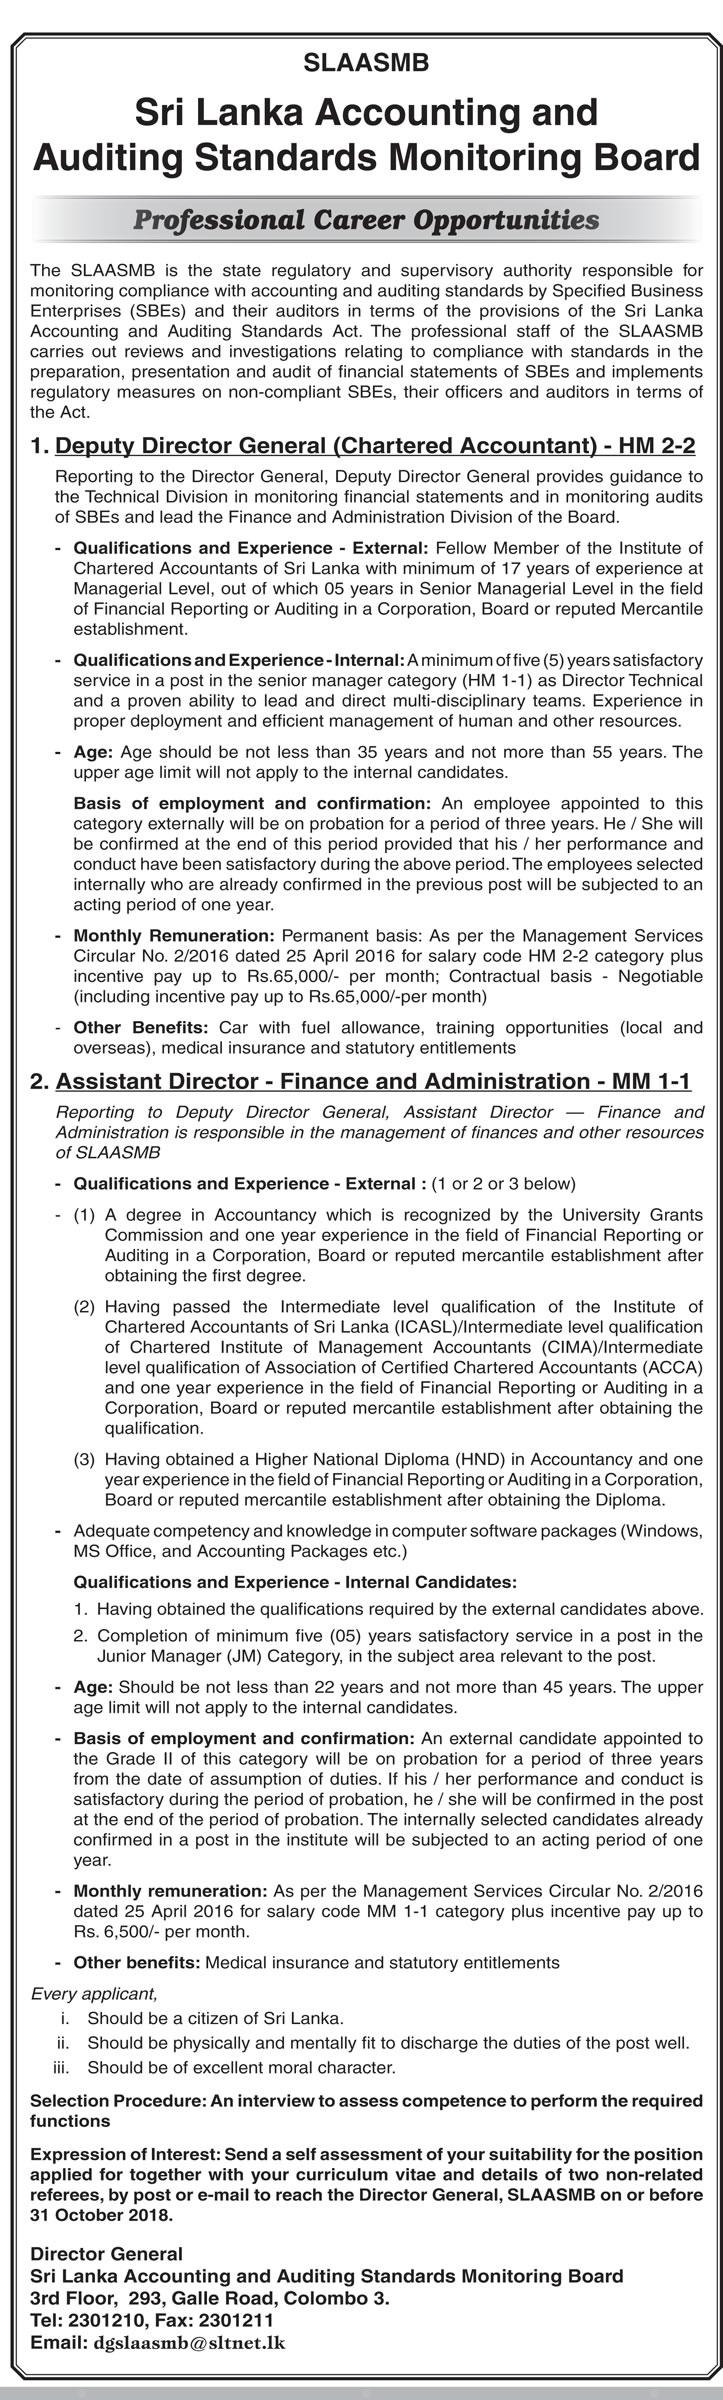 Deputy Director General Assistant Director Sri Lanka Accounting